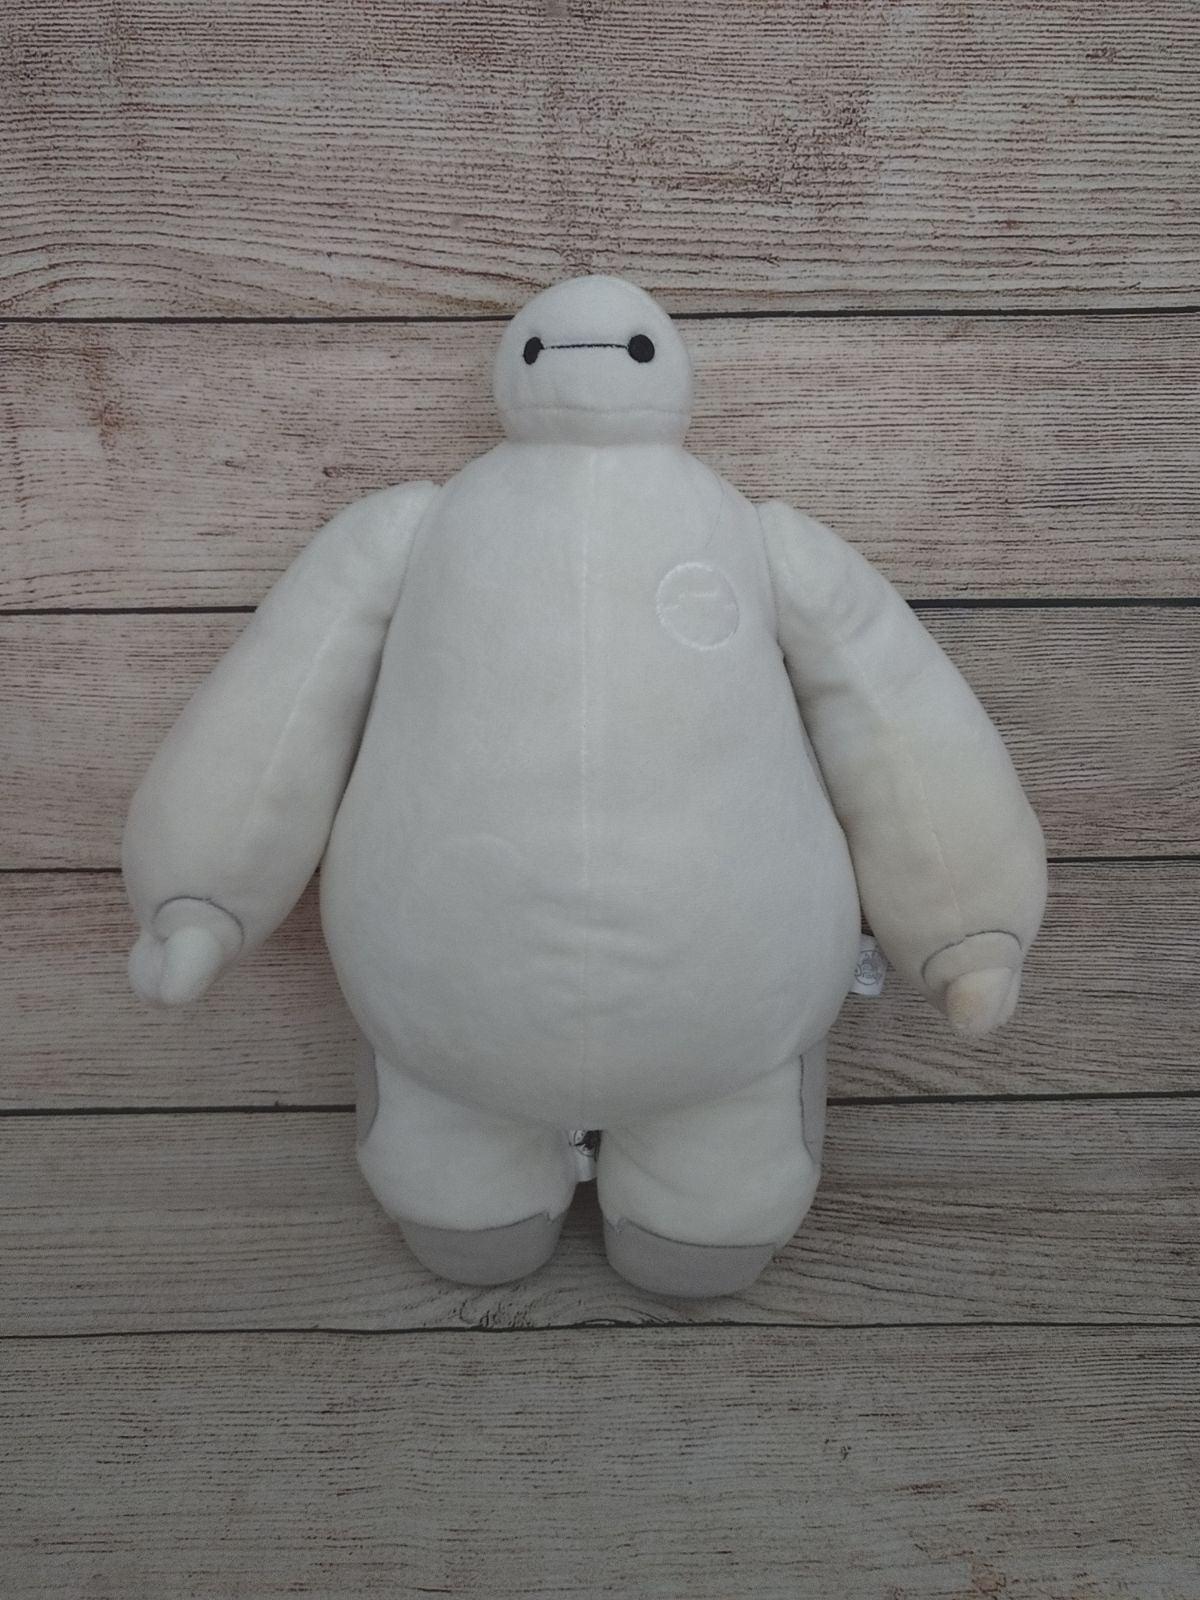 "DISNEY BIG HERO 6 Baymax Plush 15"" Doll"